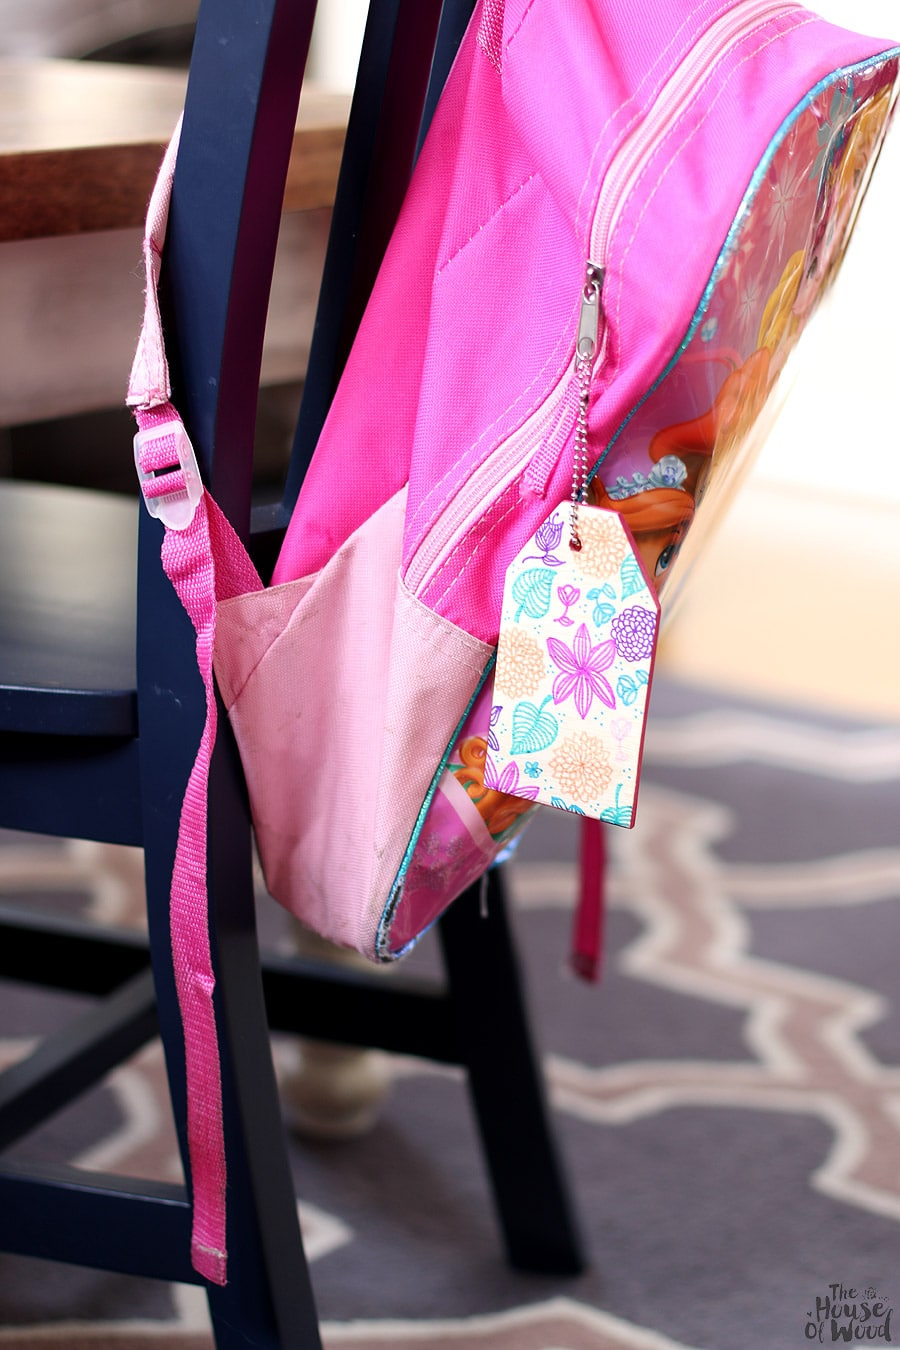 How to make DIY wood school bag tags